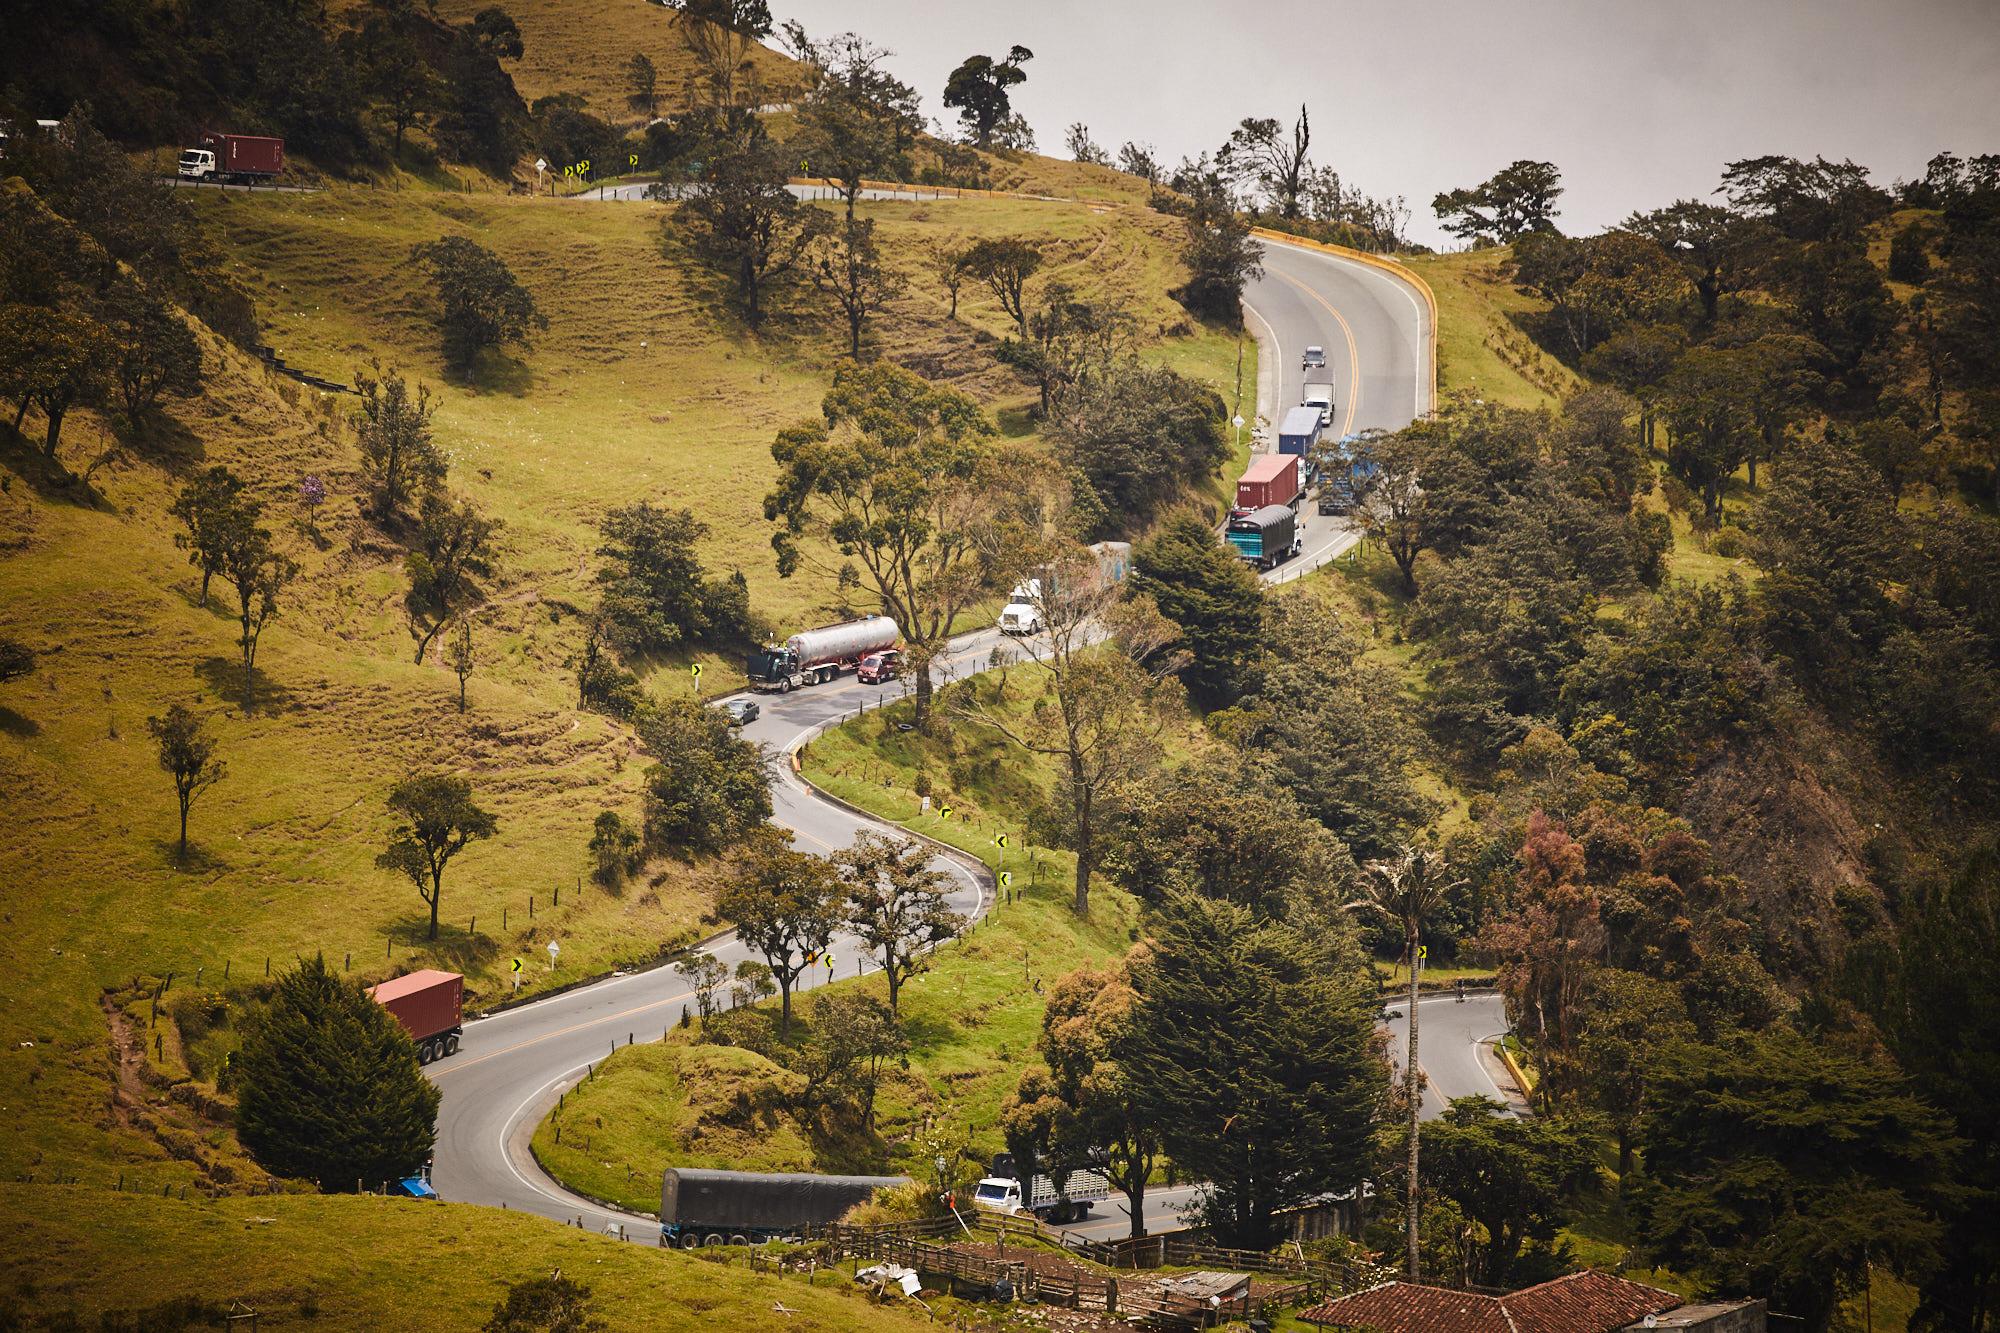 LOWRES-RADRACE-COLUMBIA-2018-CARLOS-3107.jpg